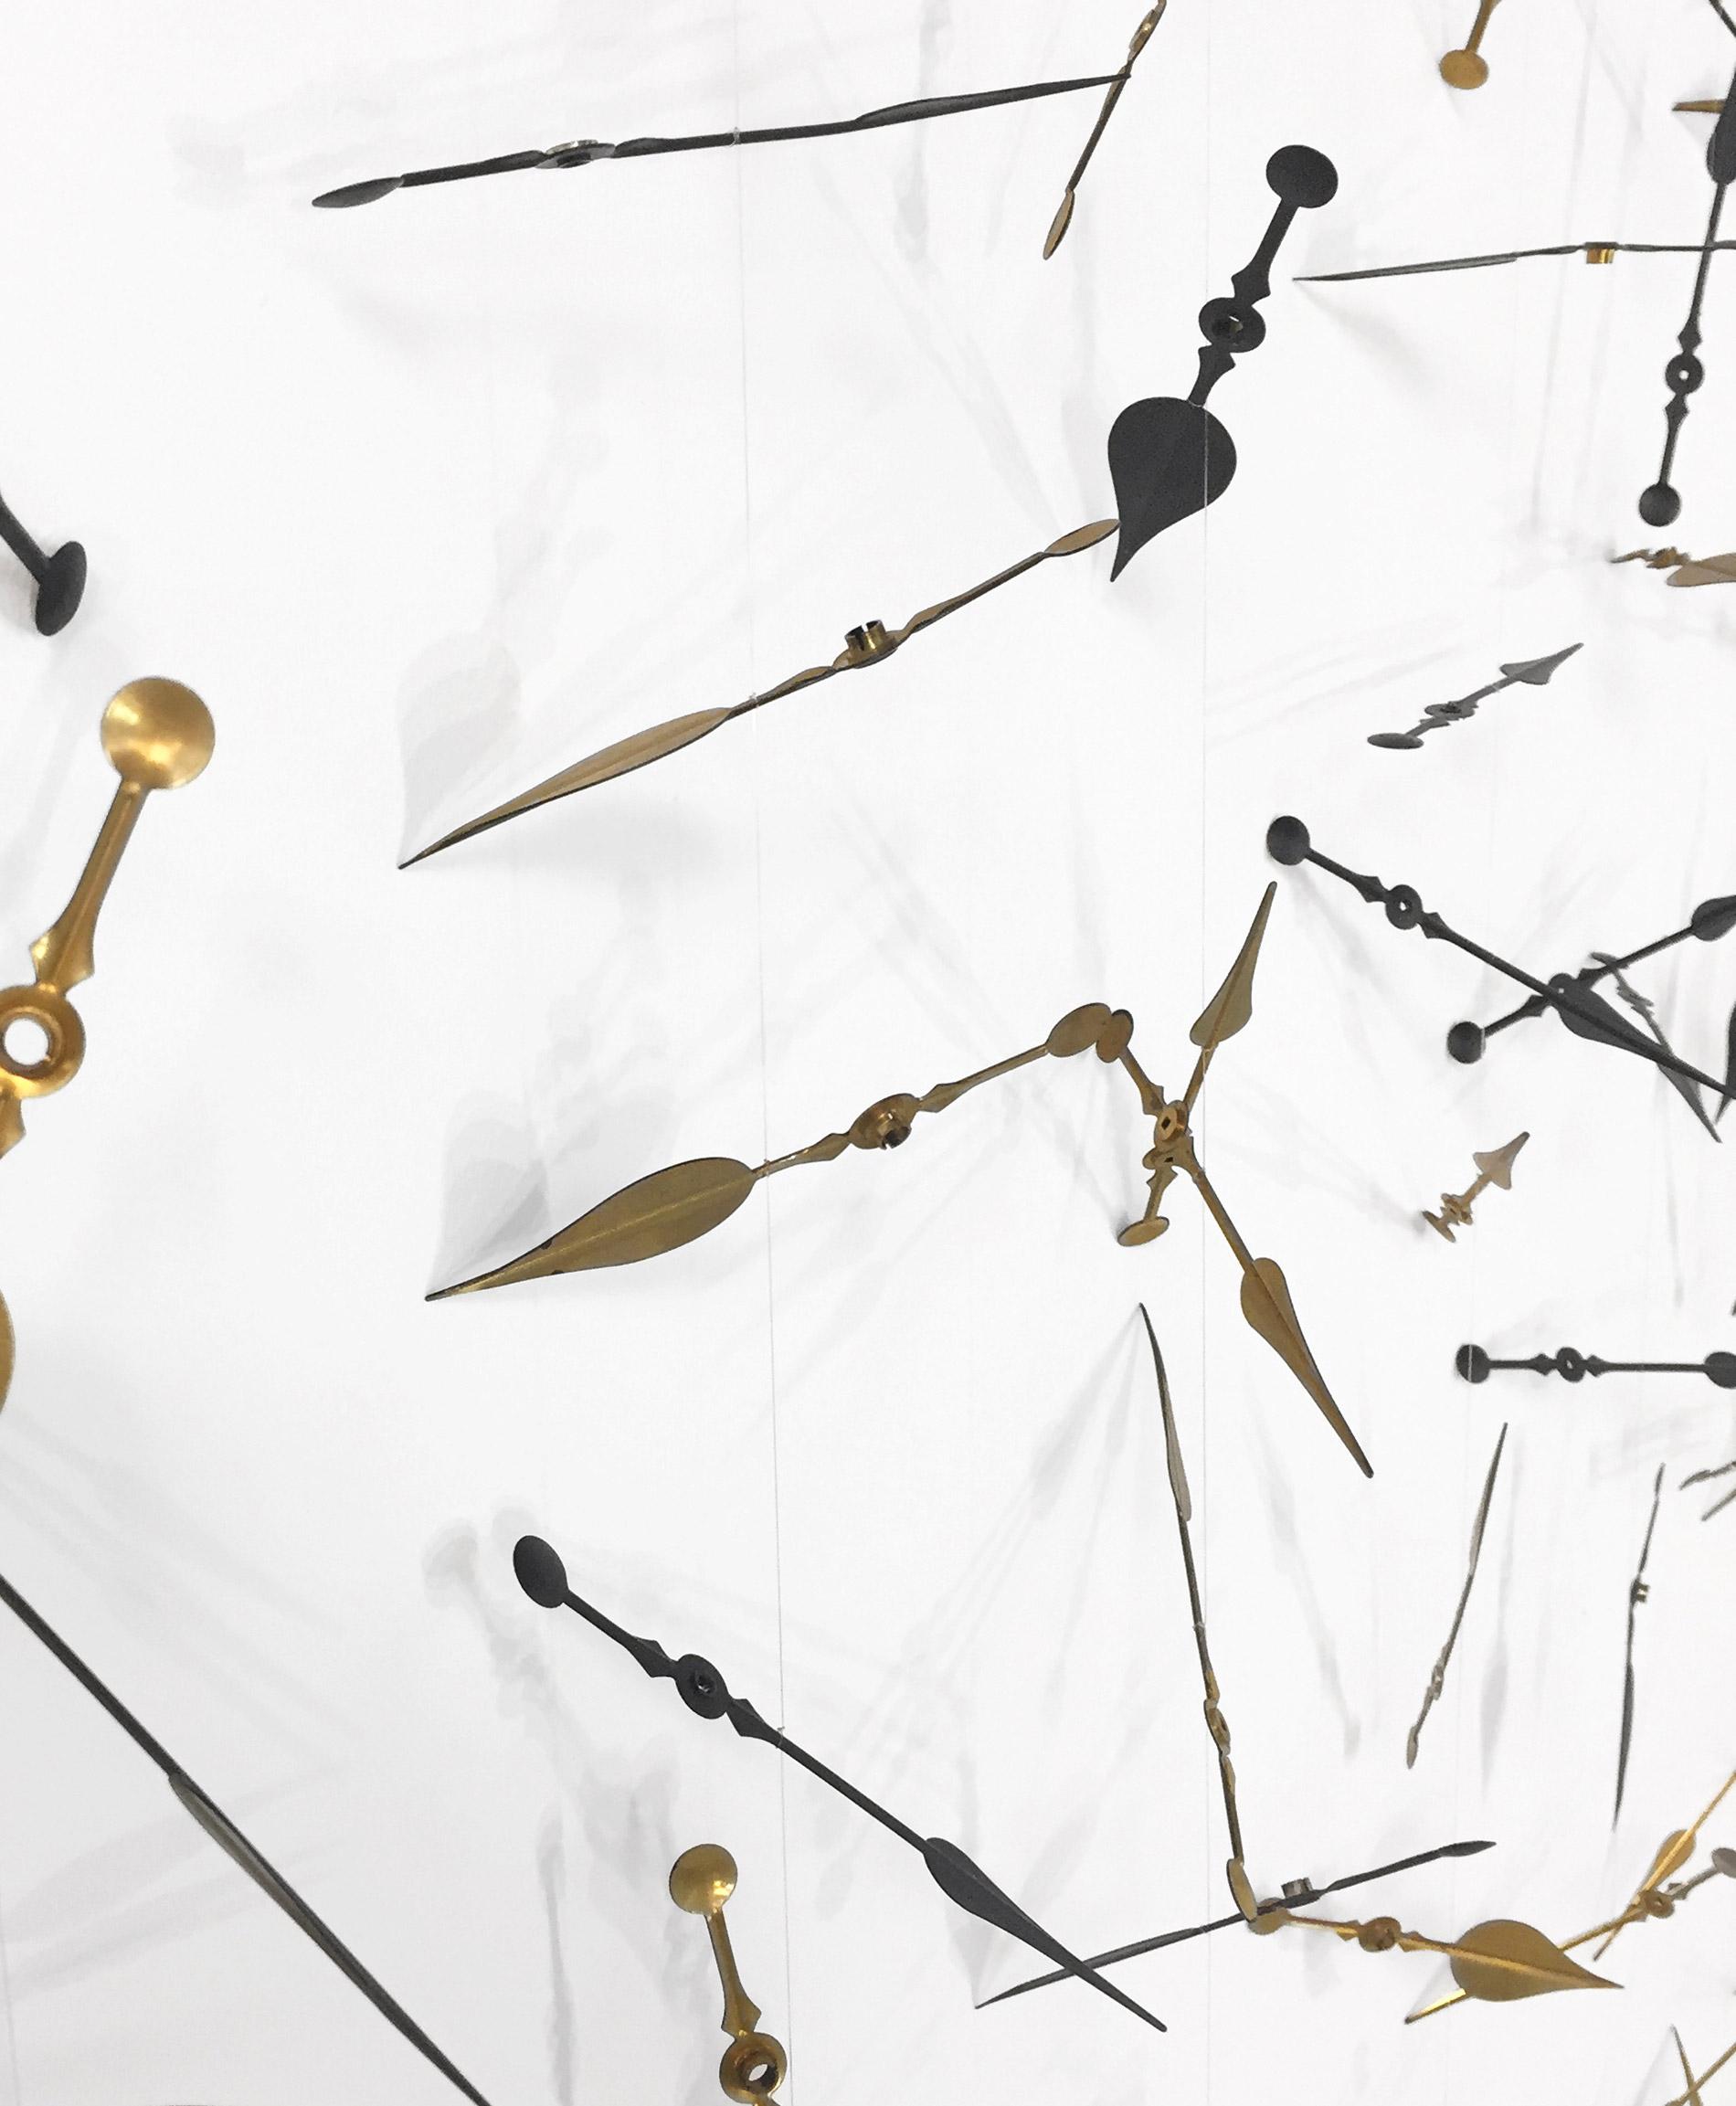 1-GUGLIELMETTI_CosmogonieB-galerie-bettina-art-contemporain-paris